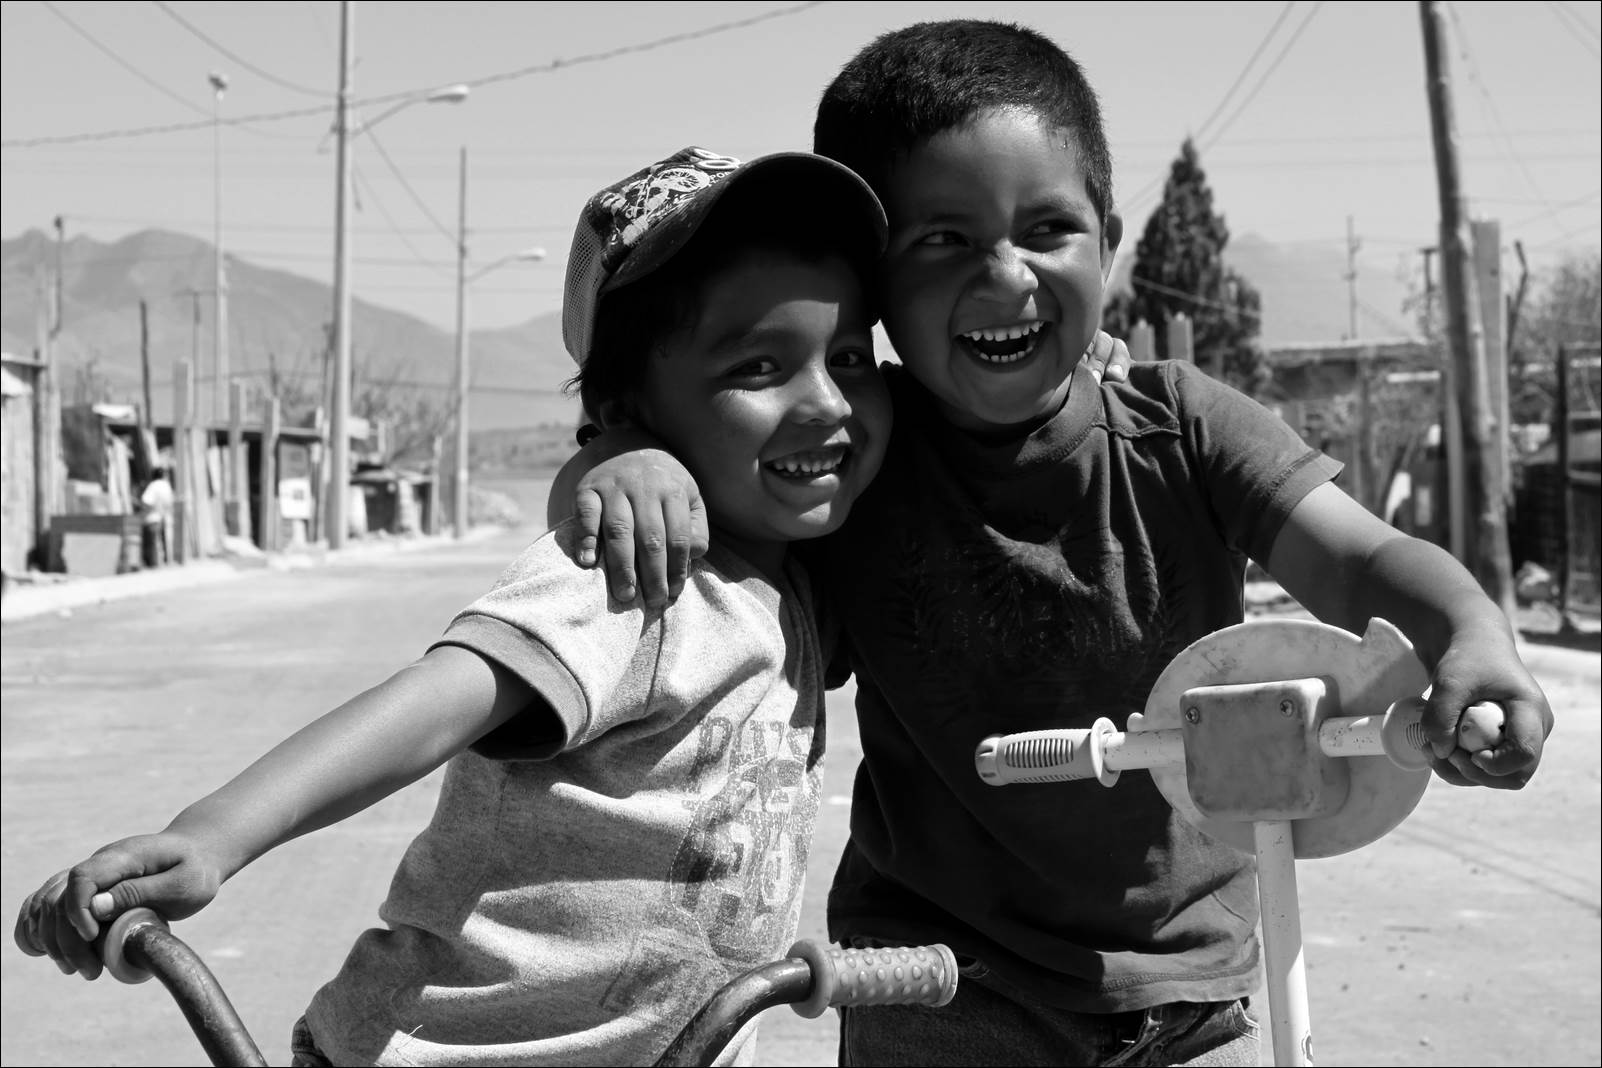 30% of Argentine children are poor